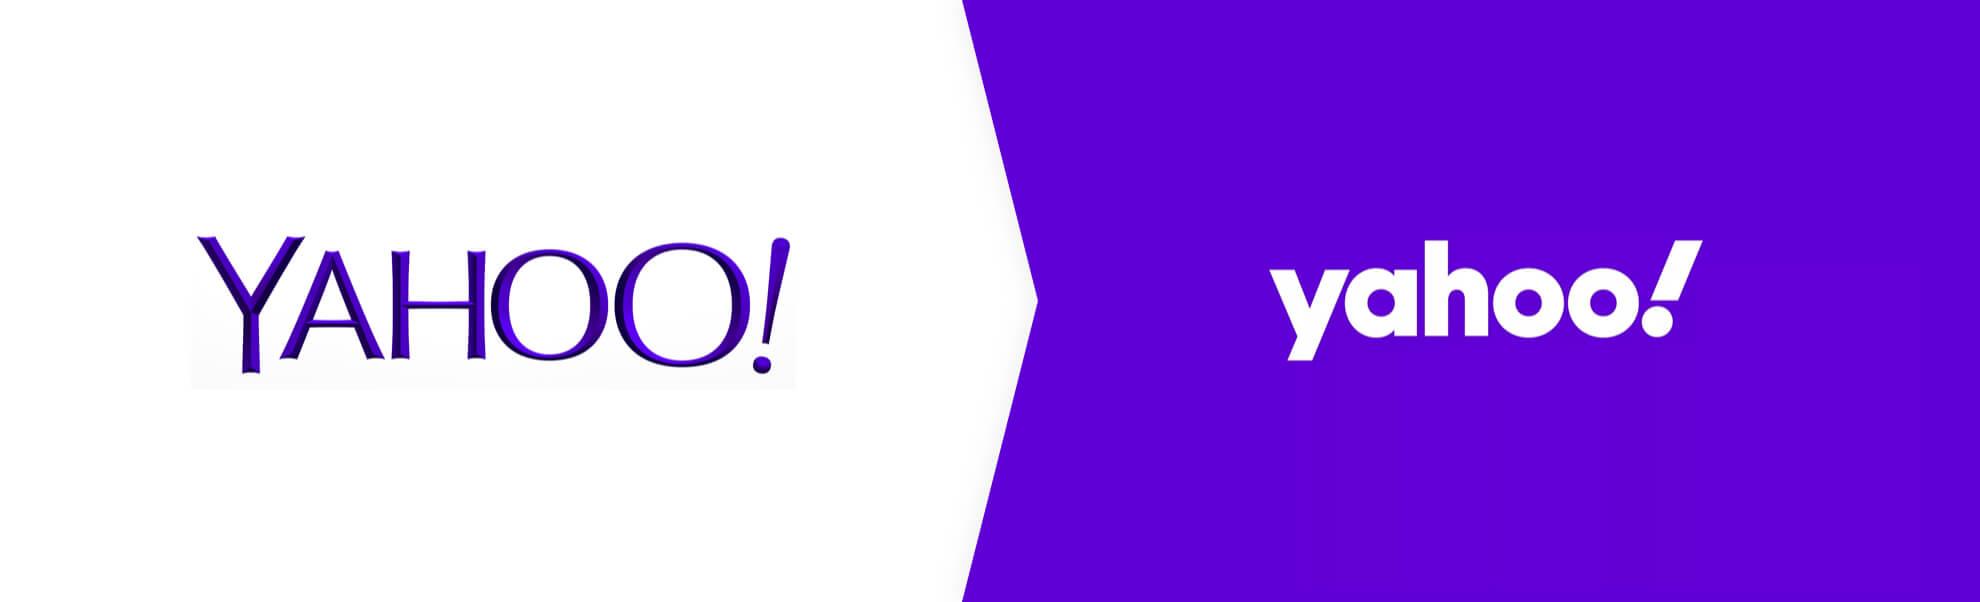 stare i nowe logo Yahoo!